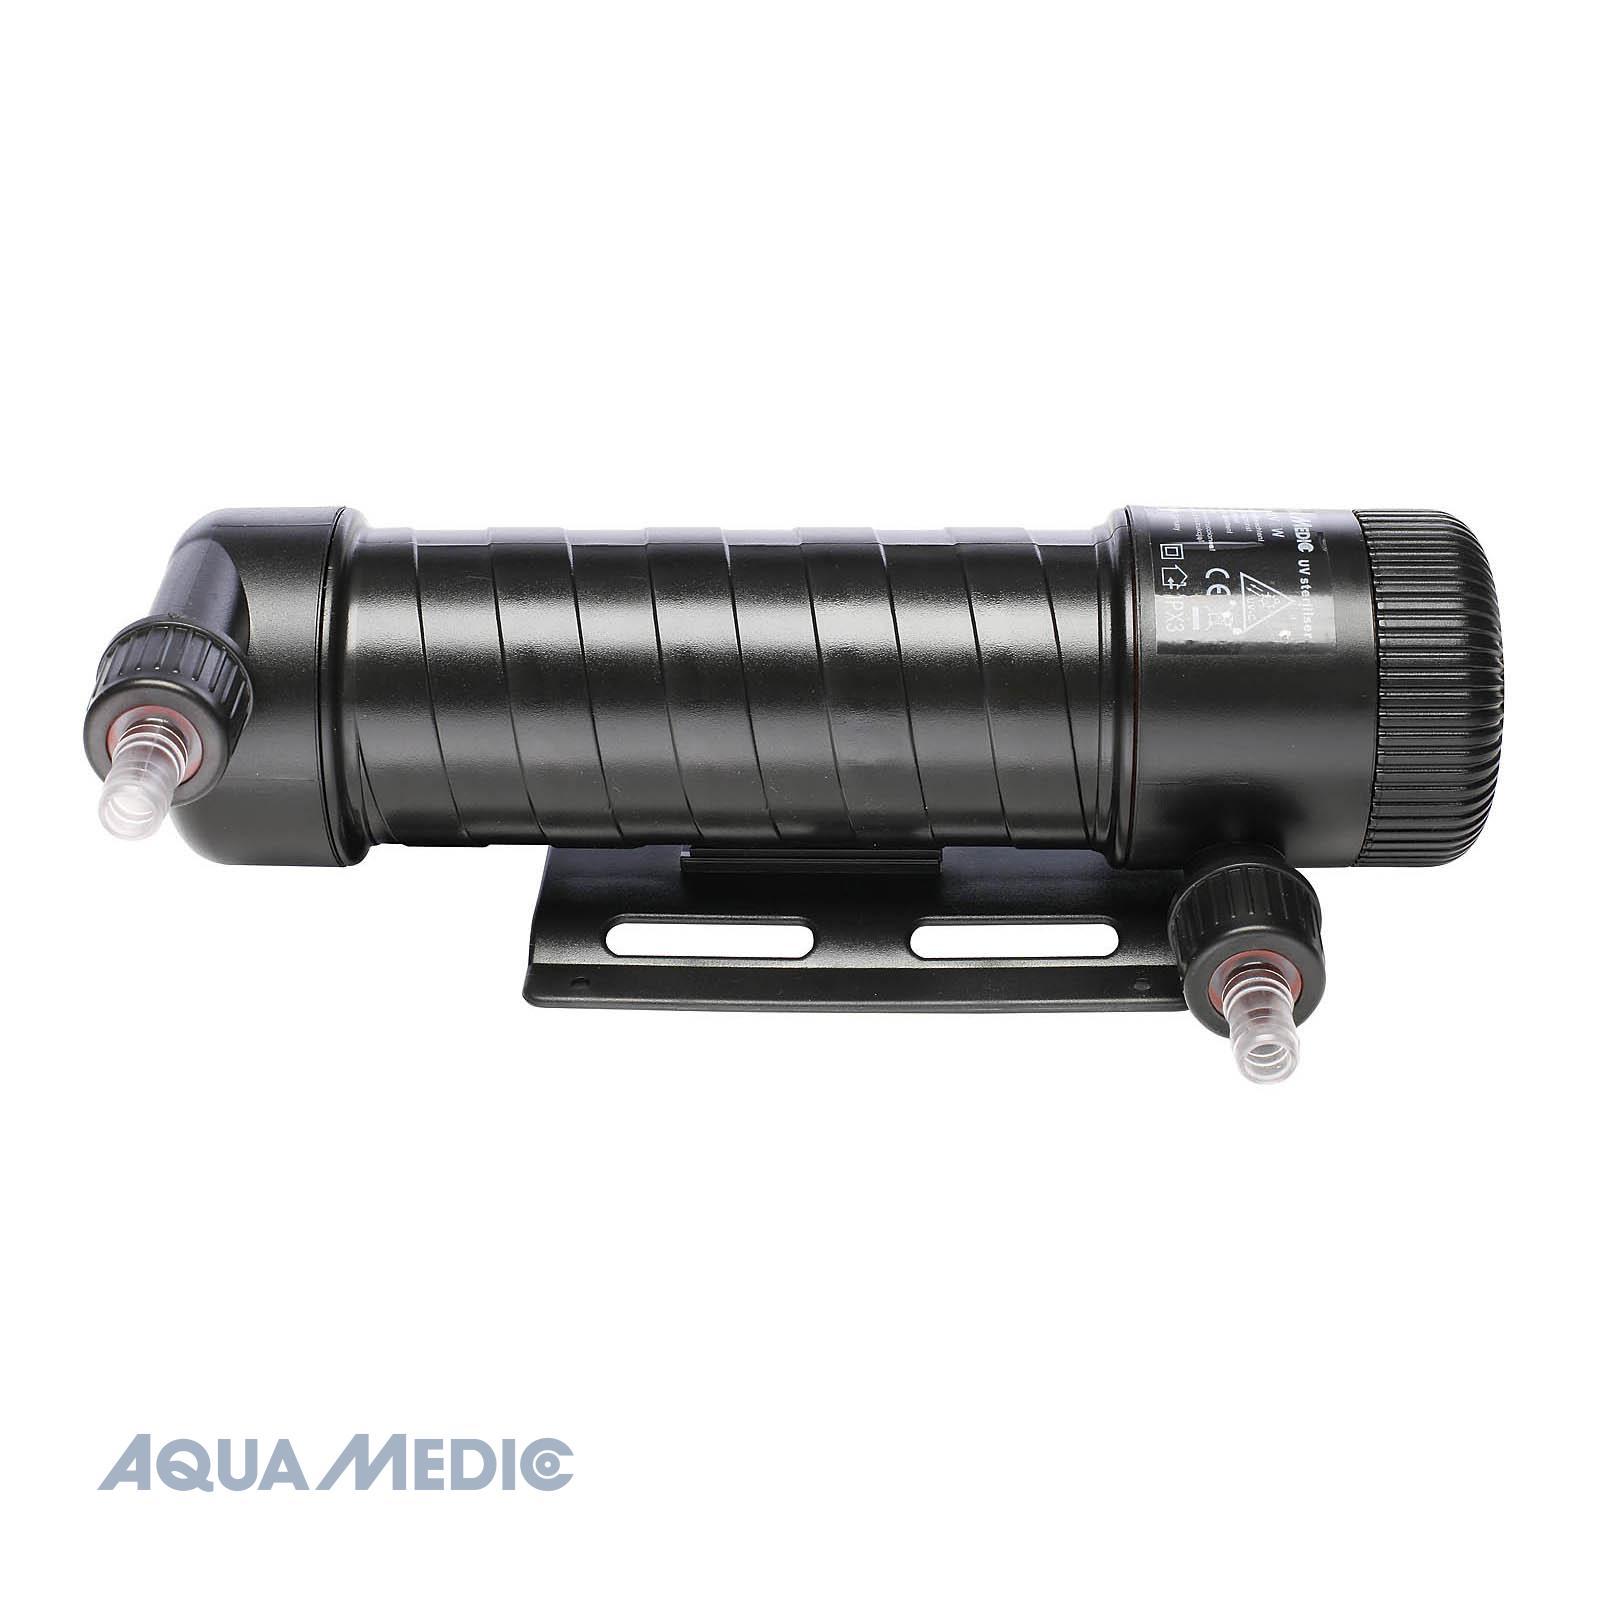 Aquamedic Uv-C Sterilizor Helix Max 11w